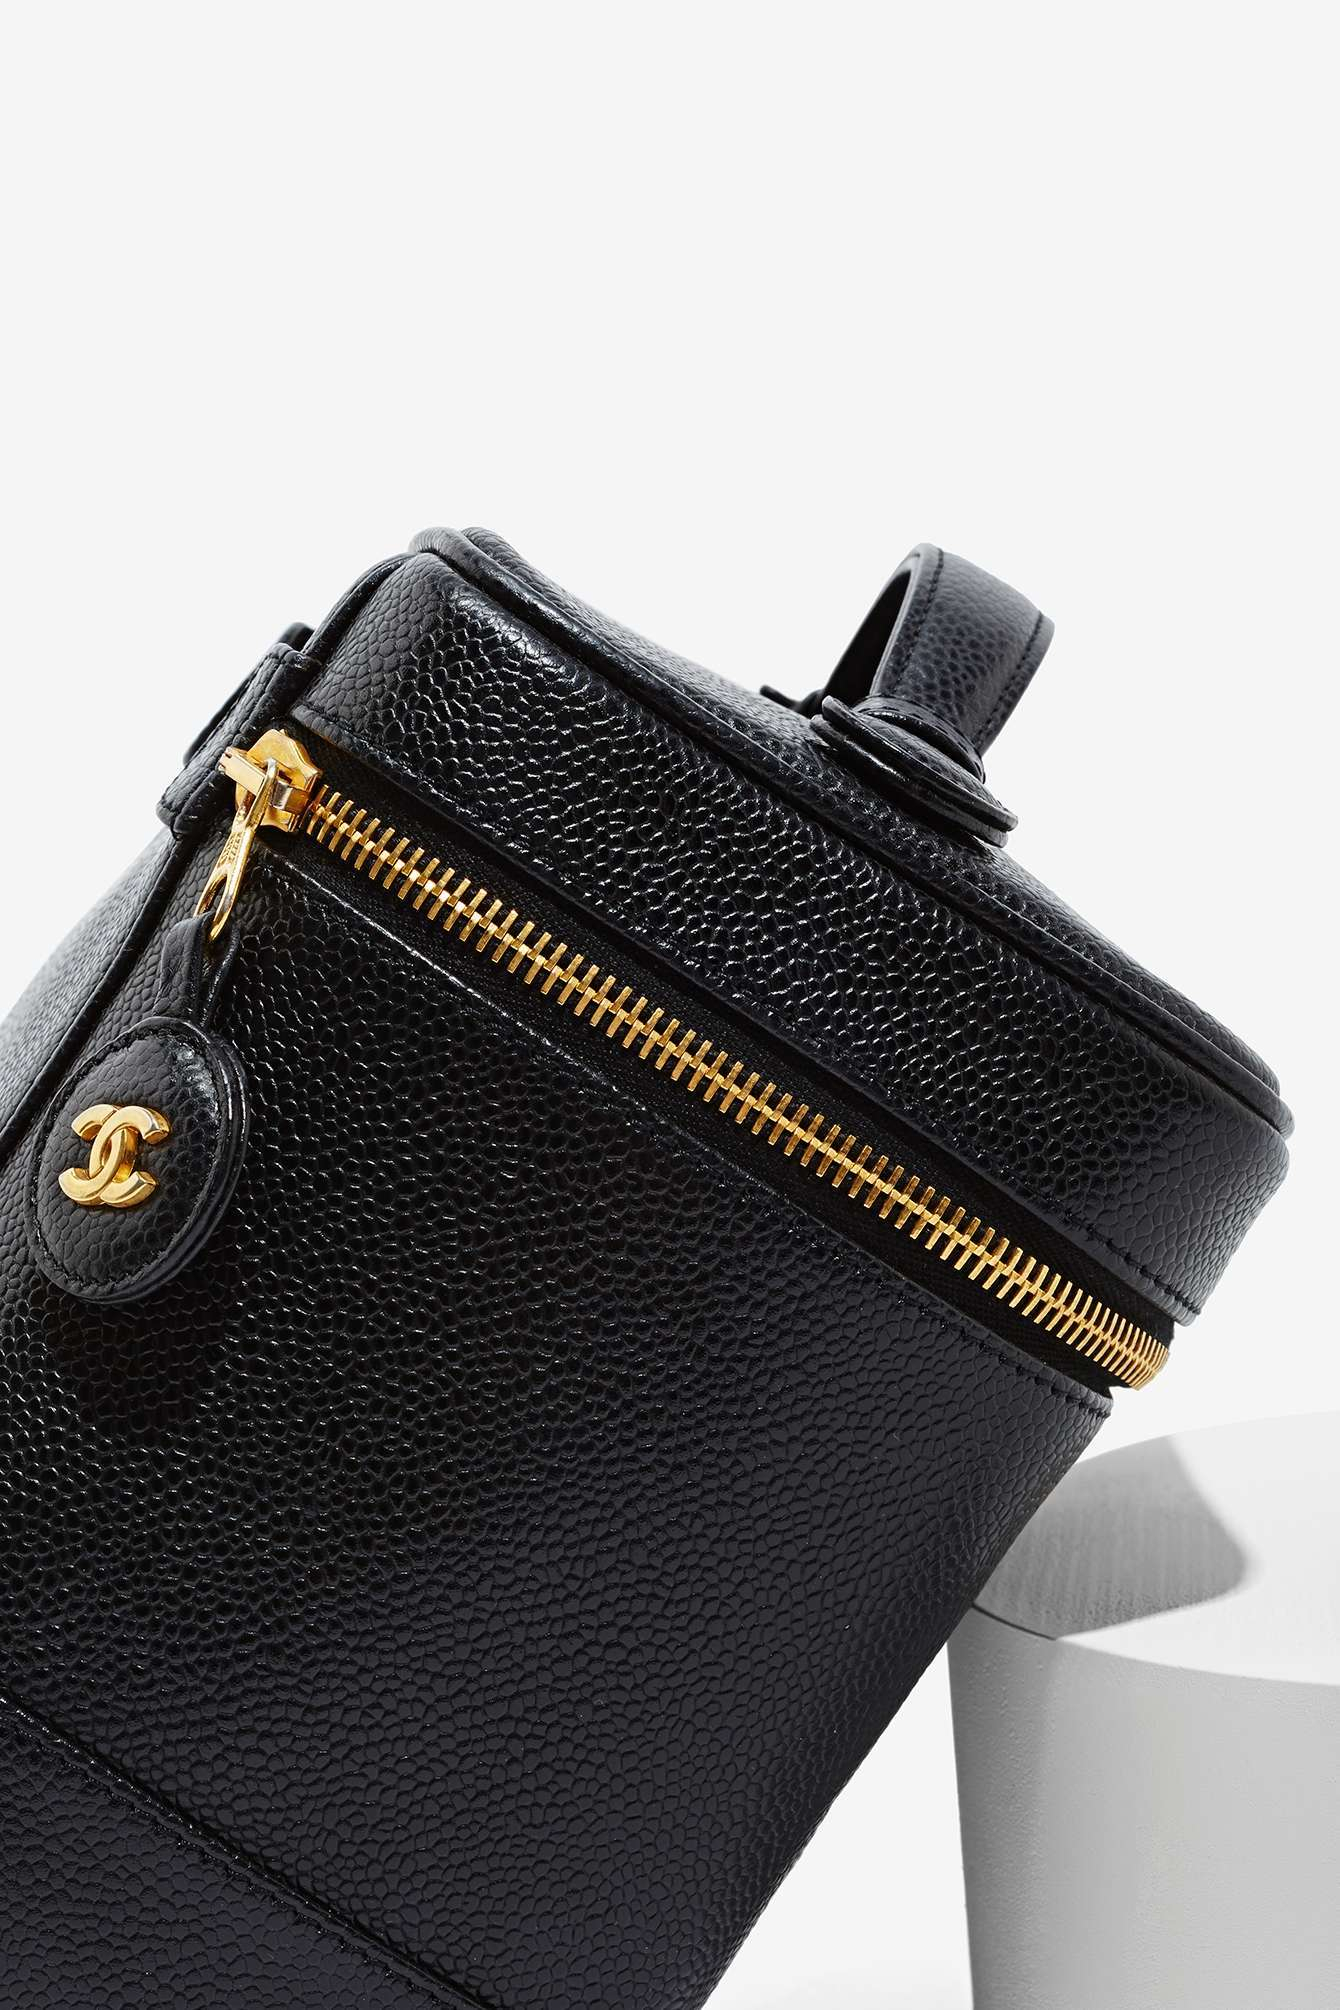 Nasty Gal Vintage Chanel Black Caviar Vanity Case - Lyst